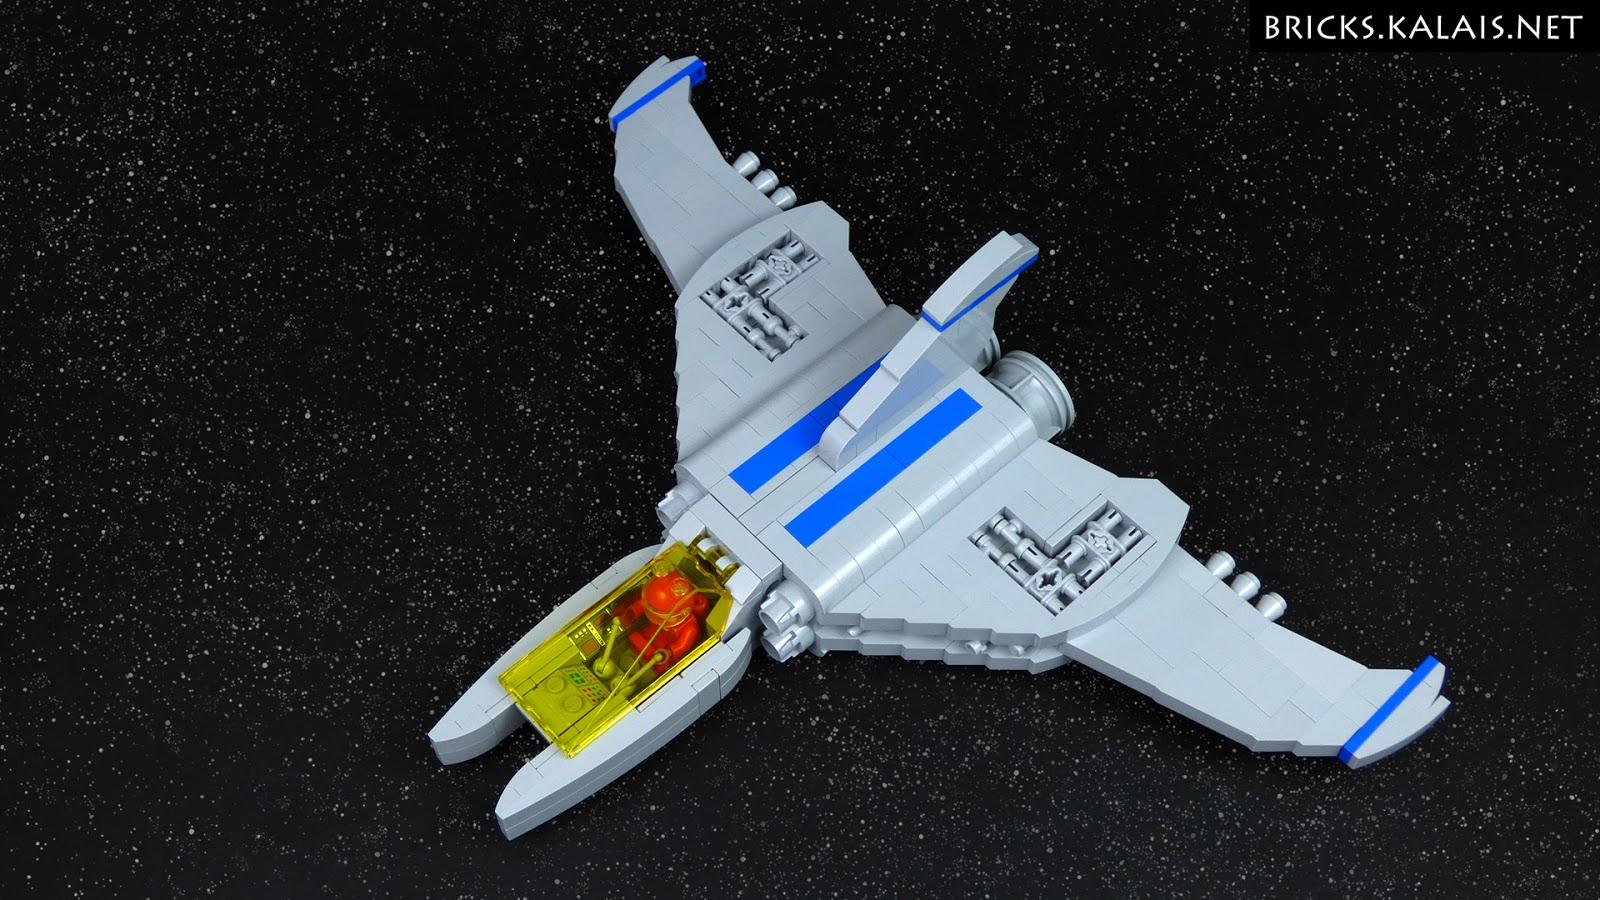 [MOC] BV-334 Spaceship